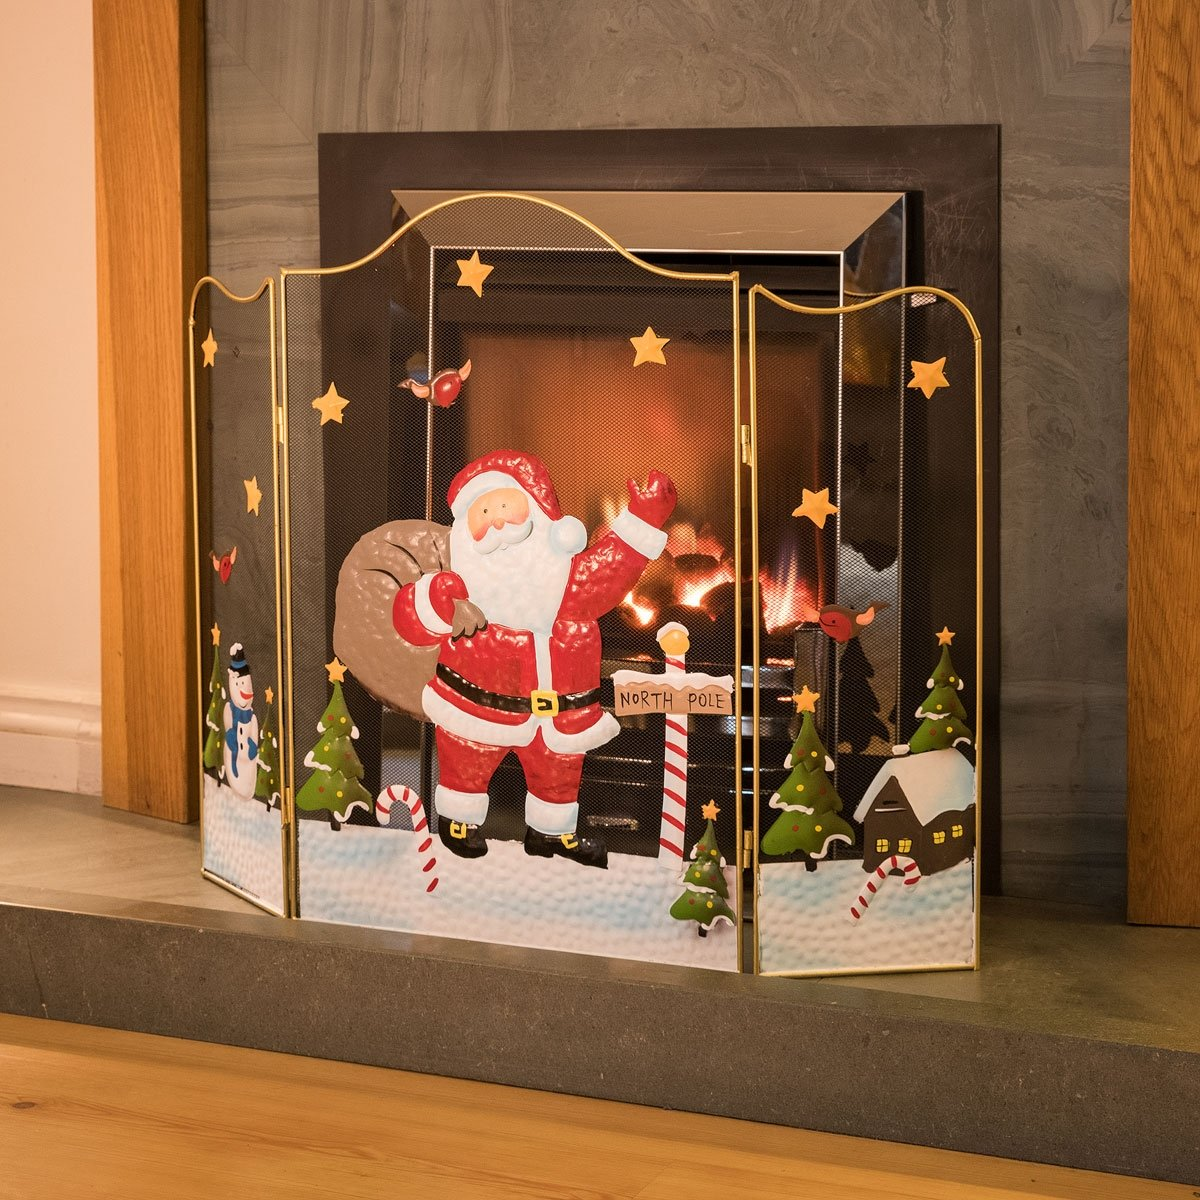 Christow 3 Panel Father Christmas Fireguard Santa Claus Fireplace 61cm